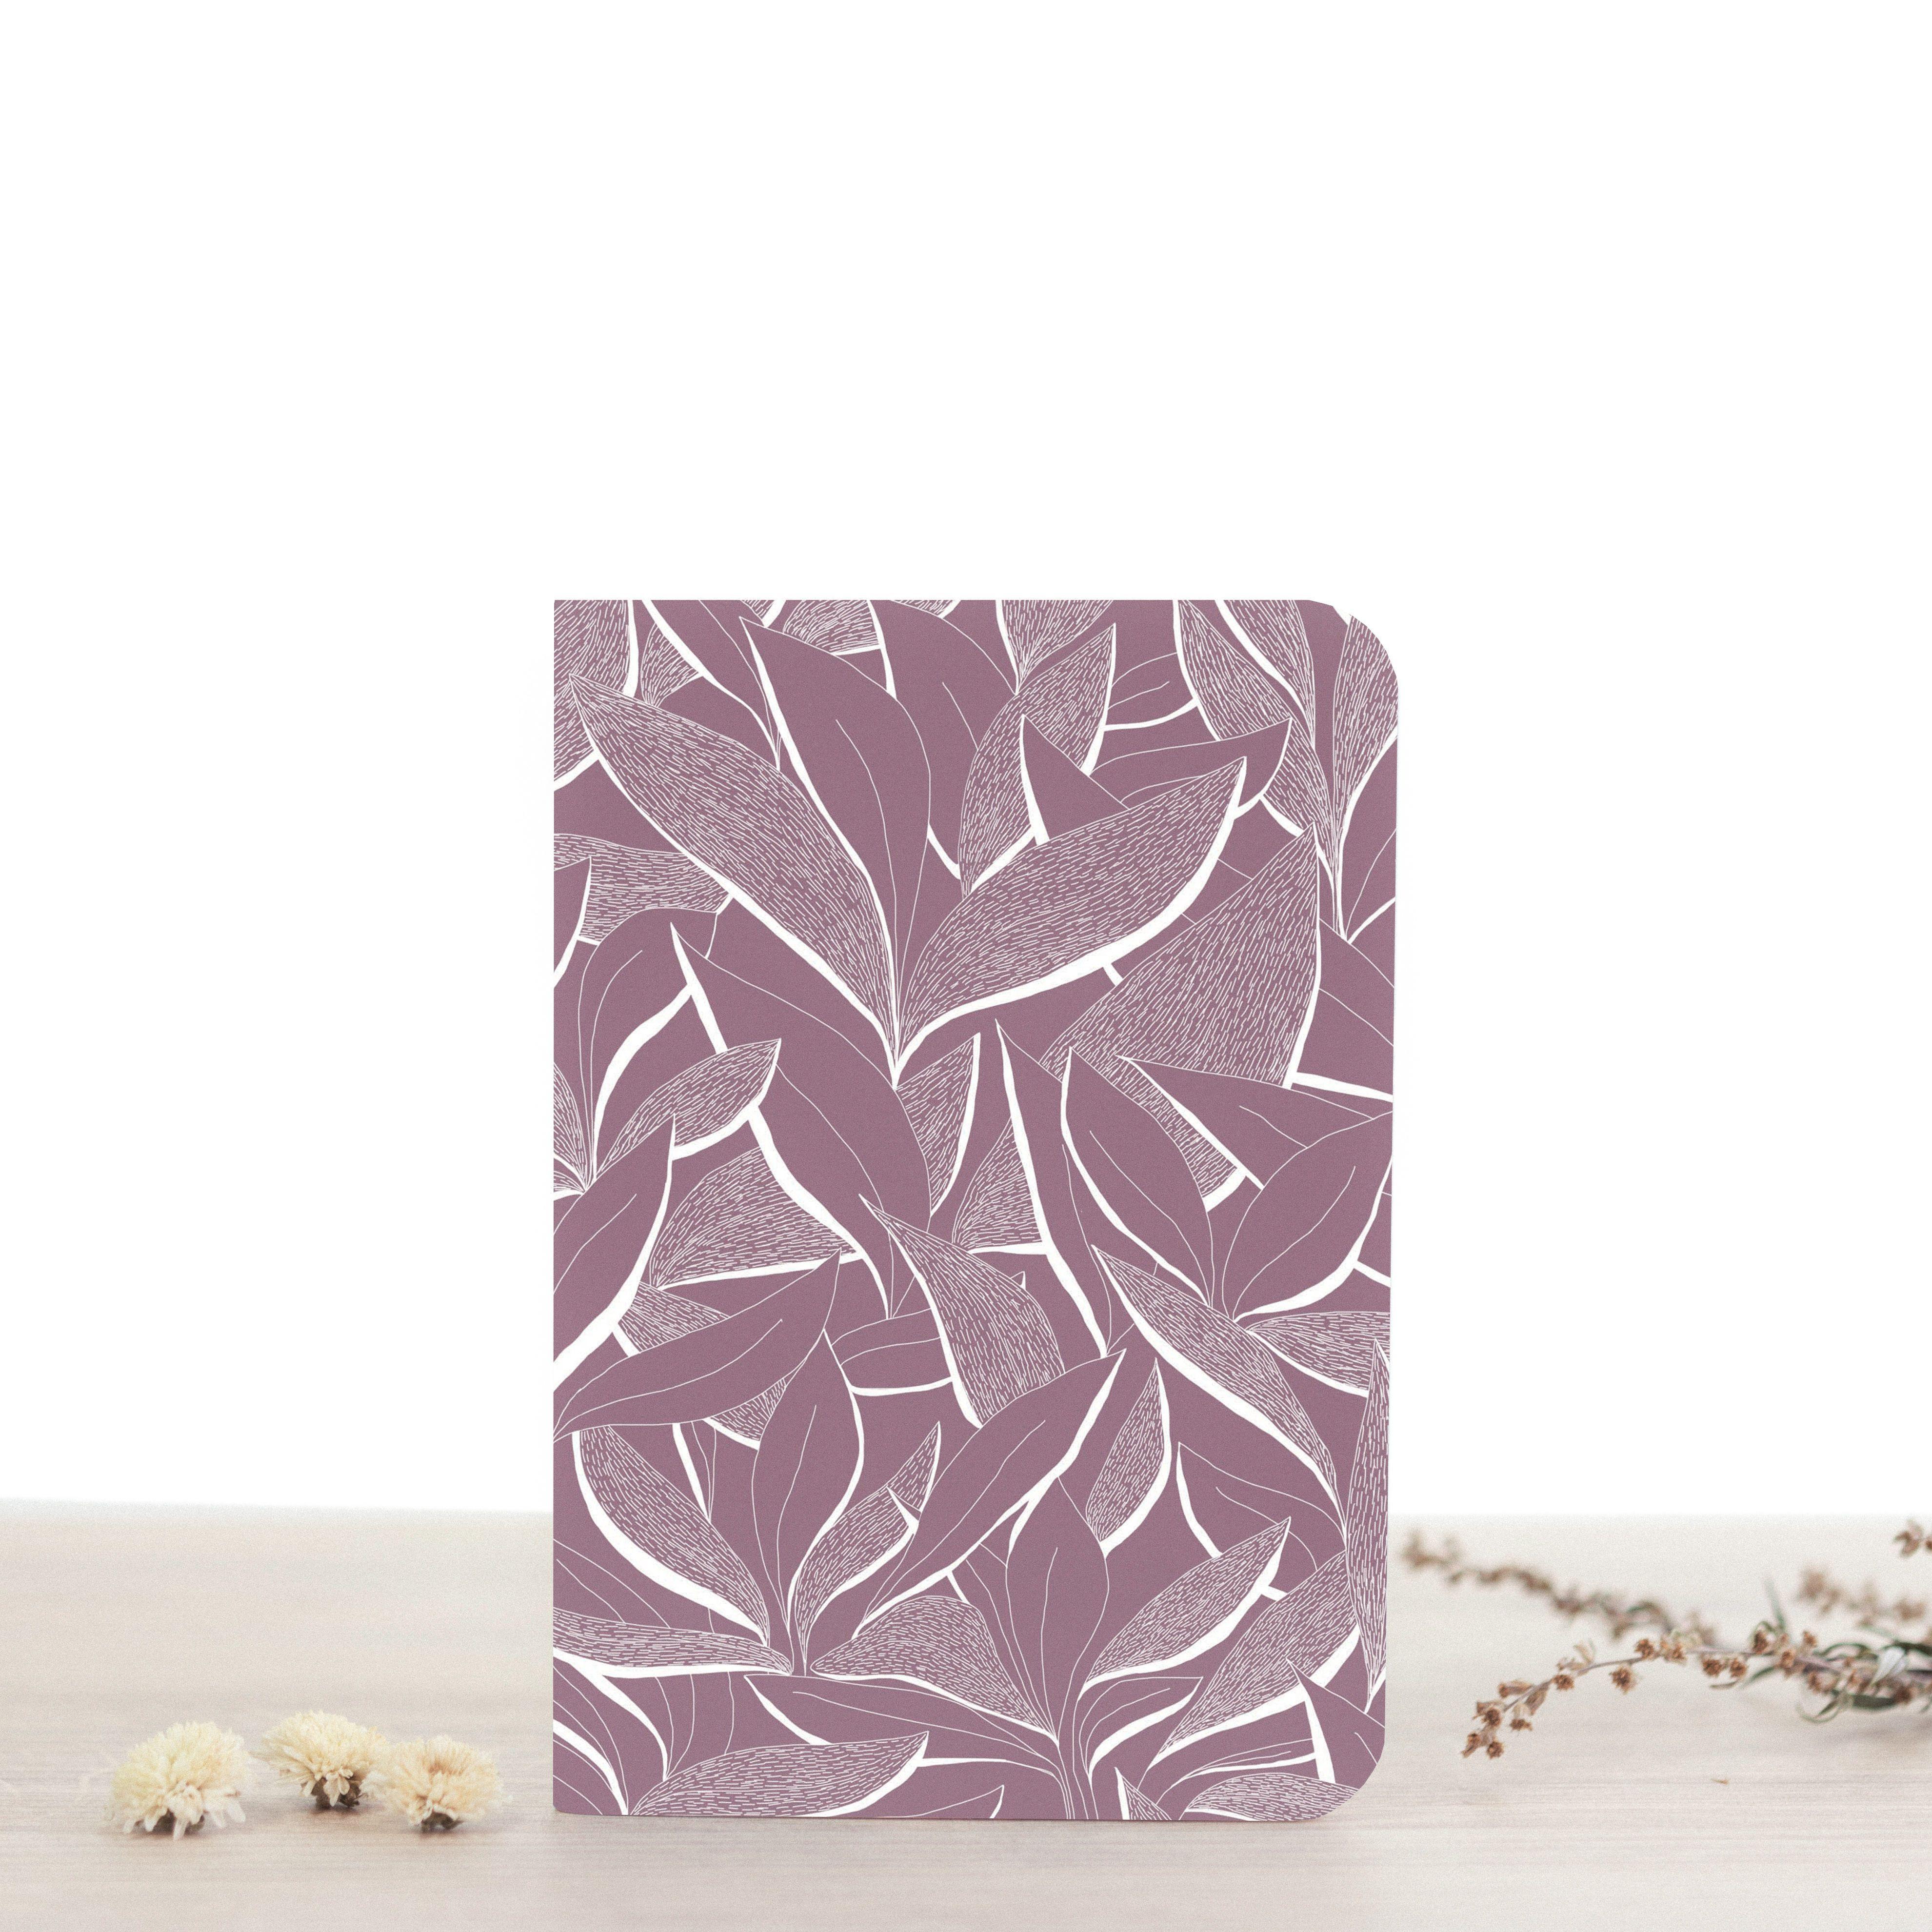 Atelier Bobbie A5 Notebook - Antonin - Ruled